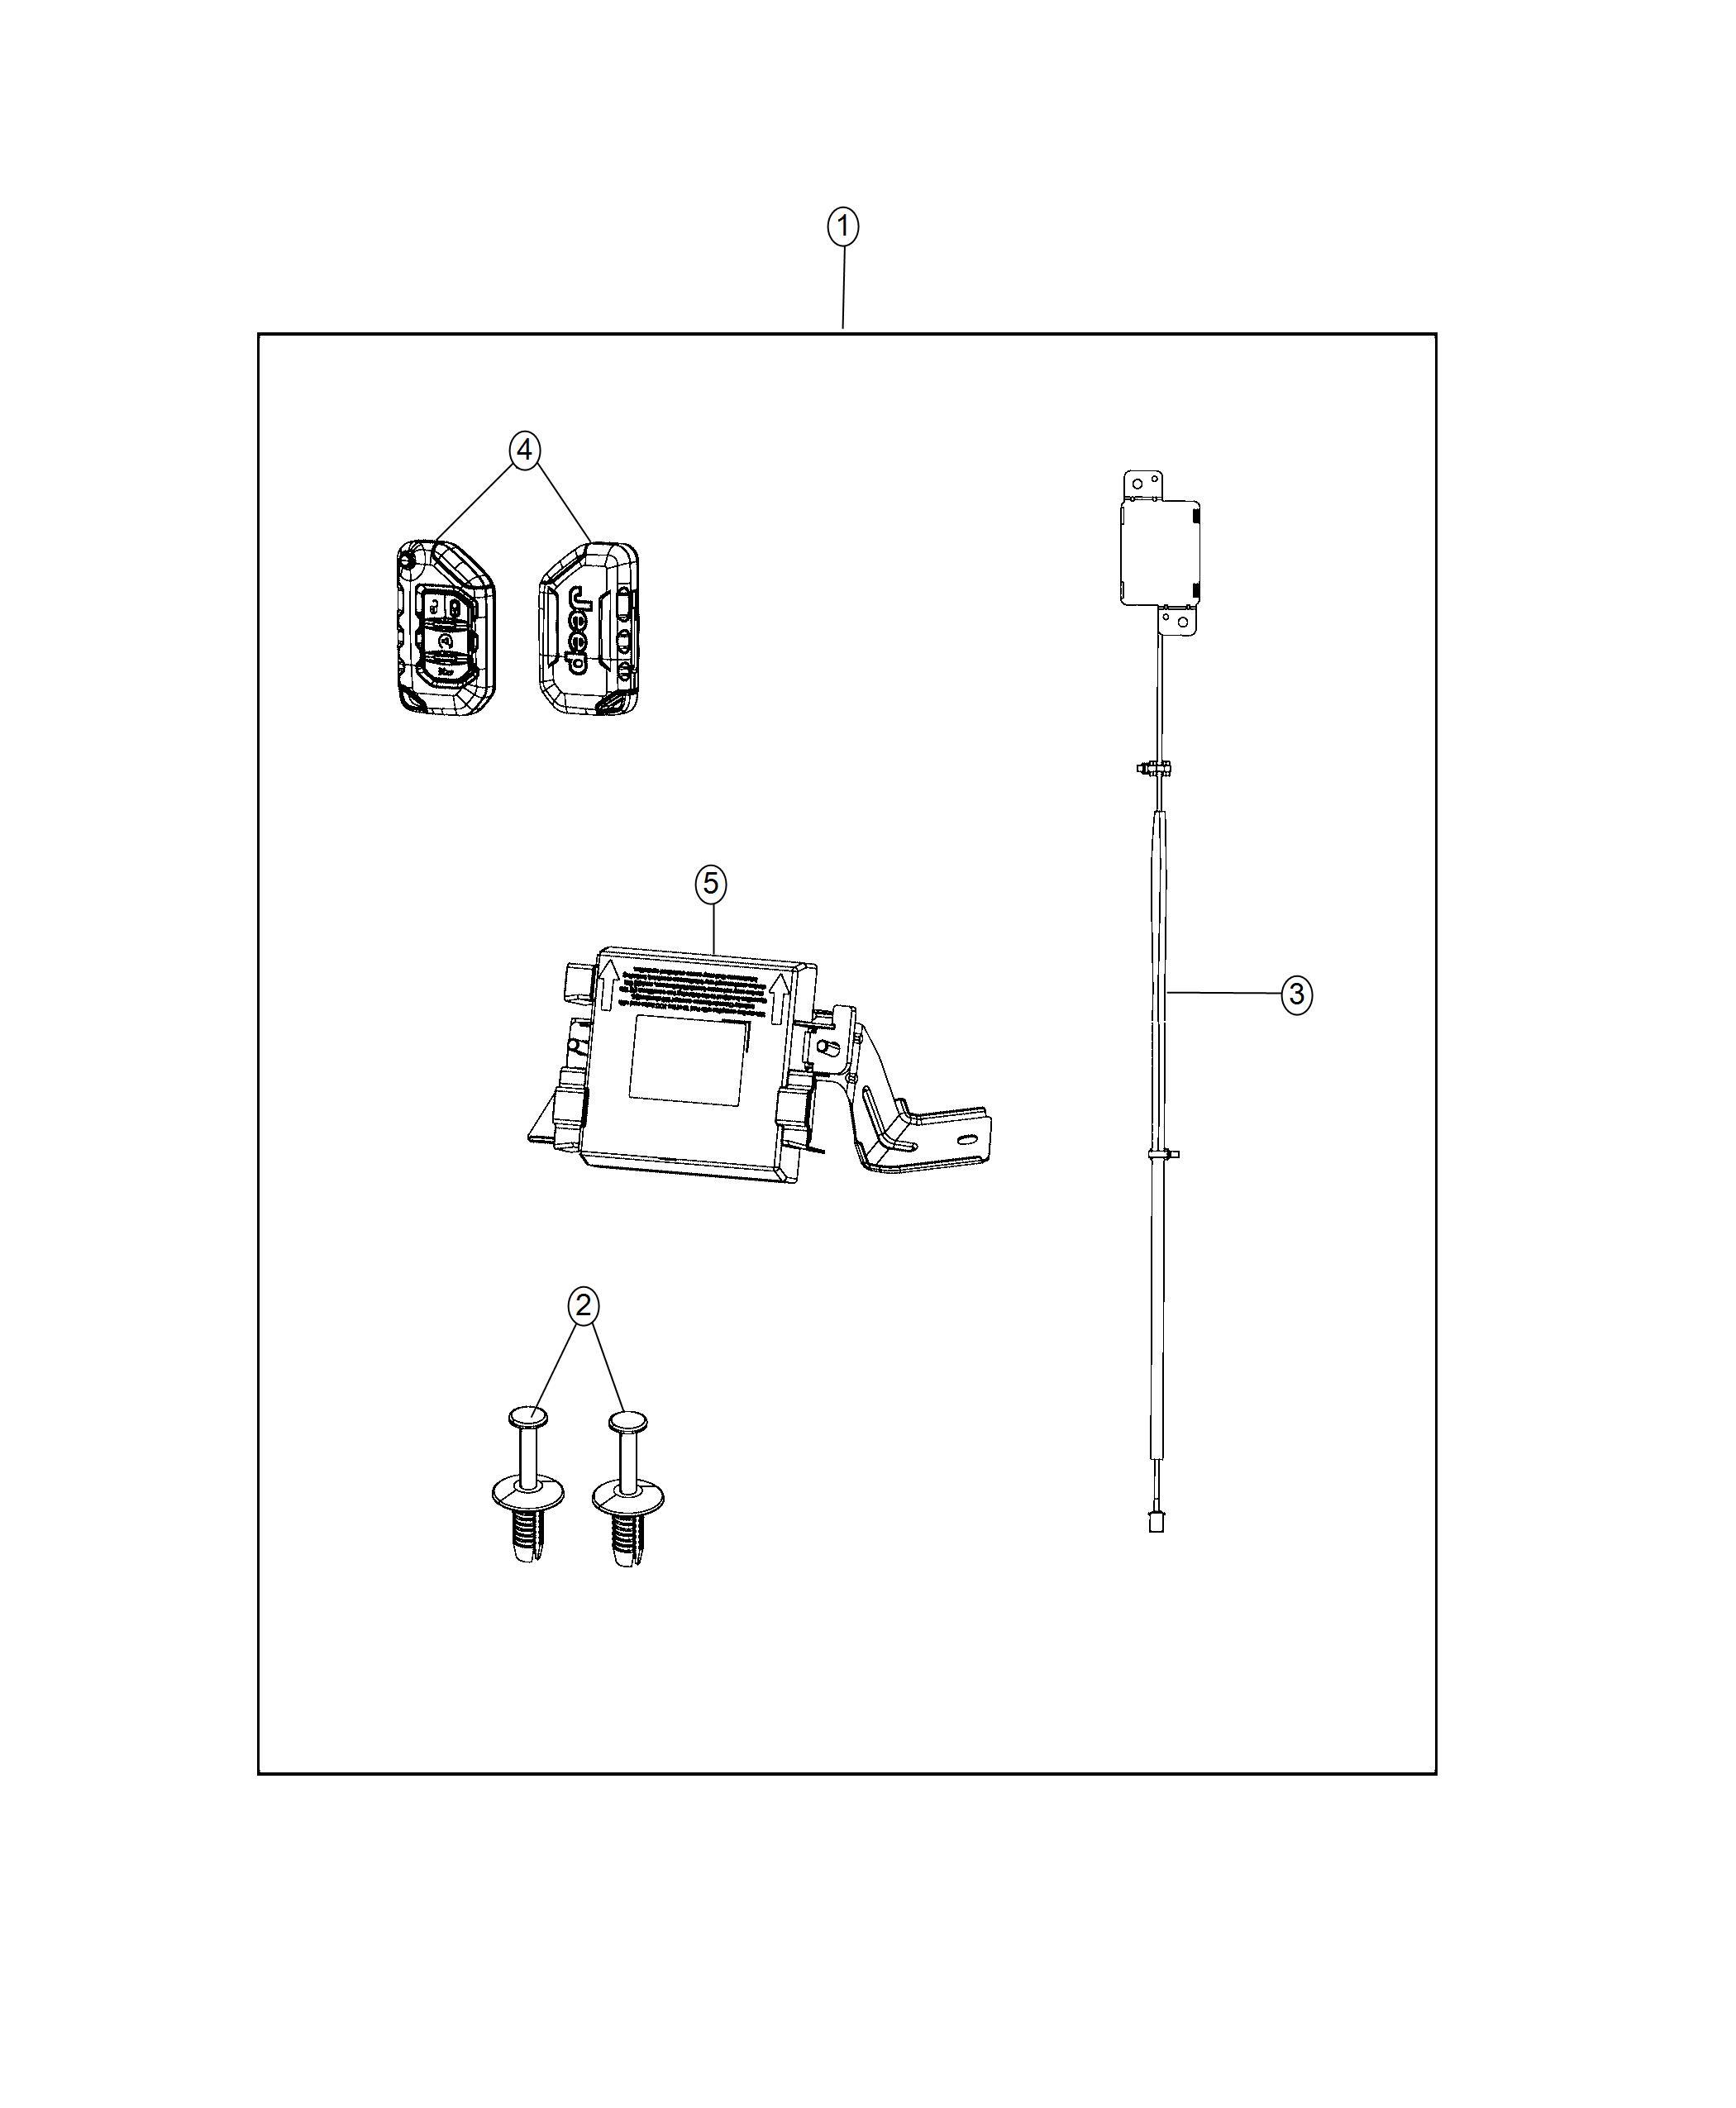 Jeep Wrangler Transmitter Integrated Key Fob Cut